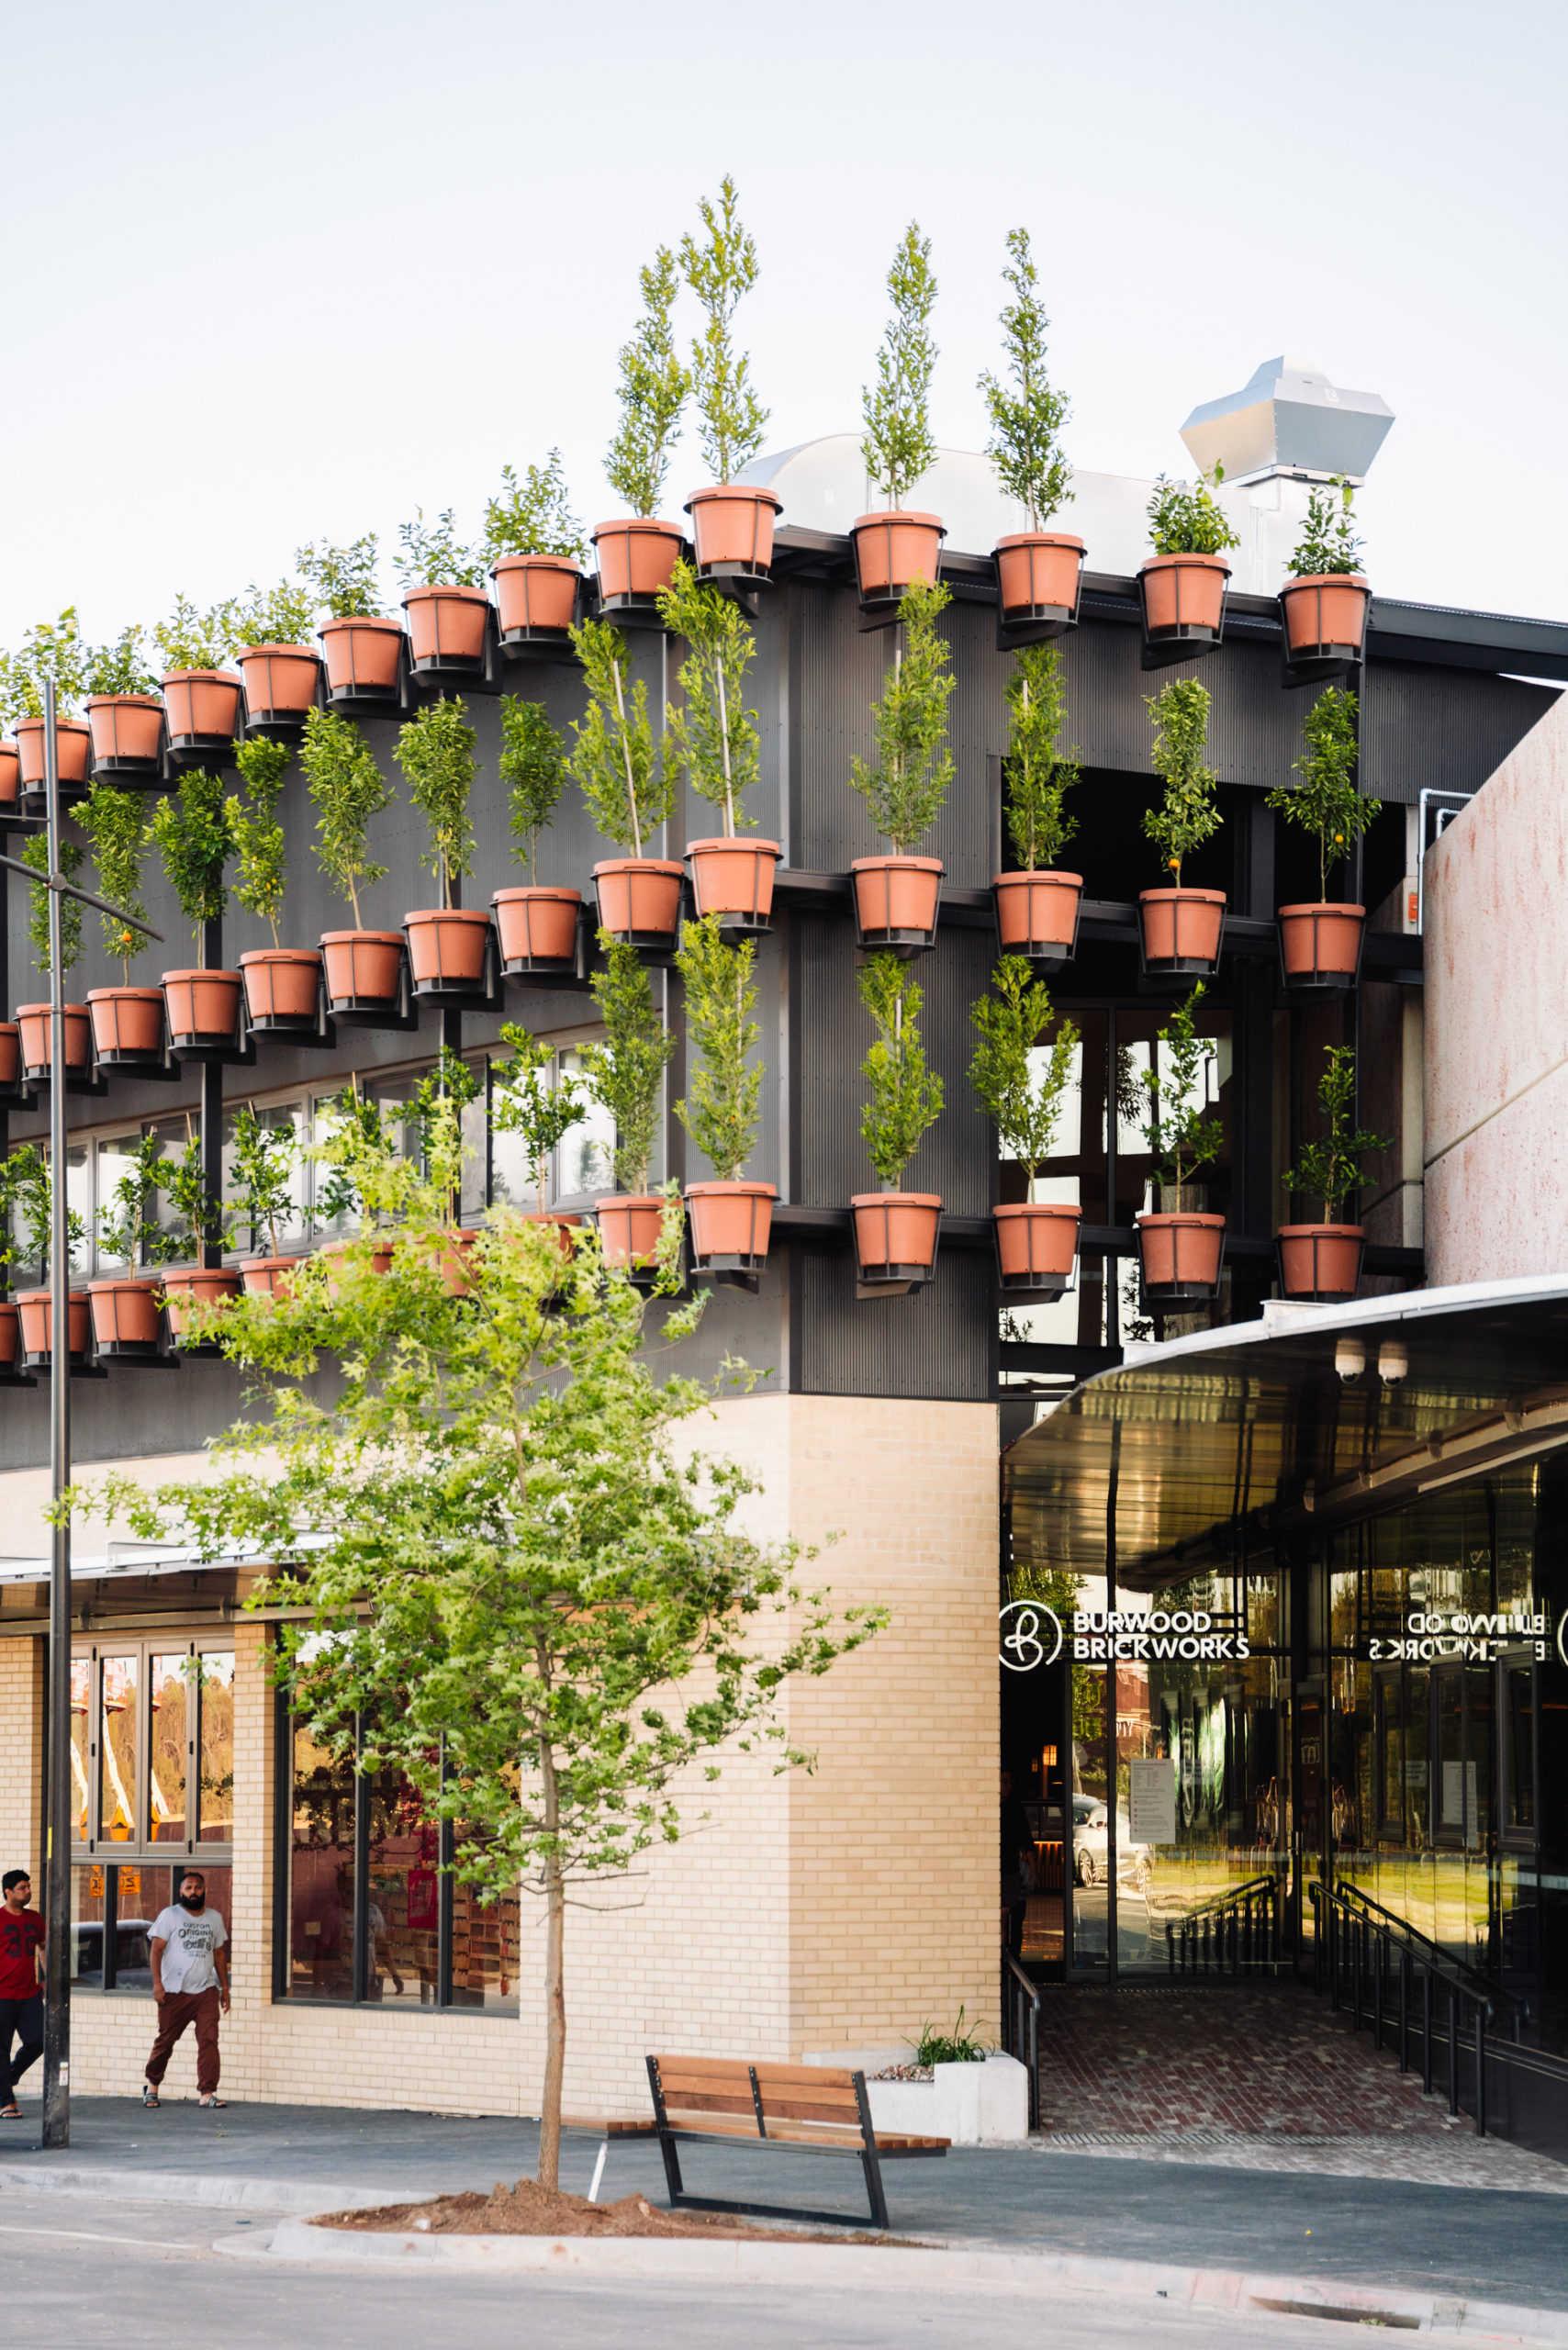 Burwood Brickworks, The World's Most Sustainable Shopping Centre